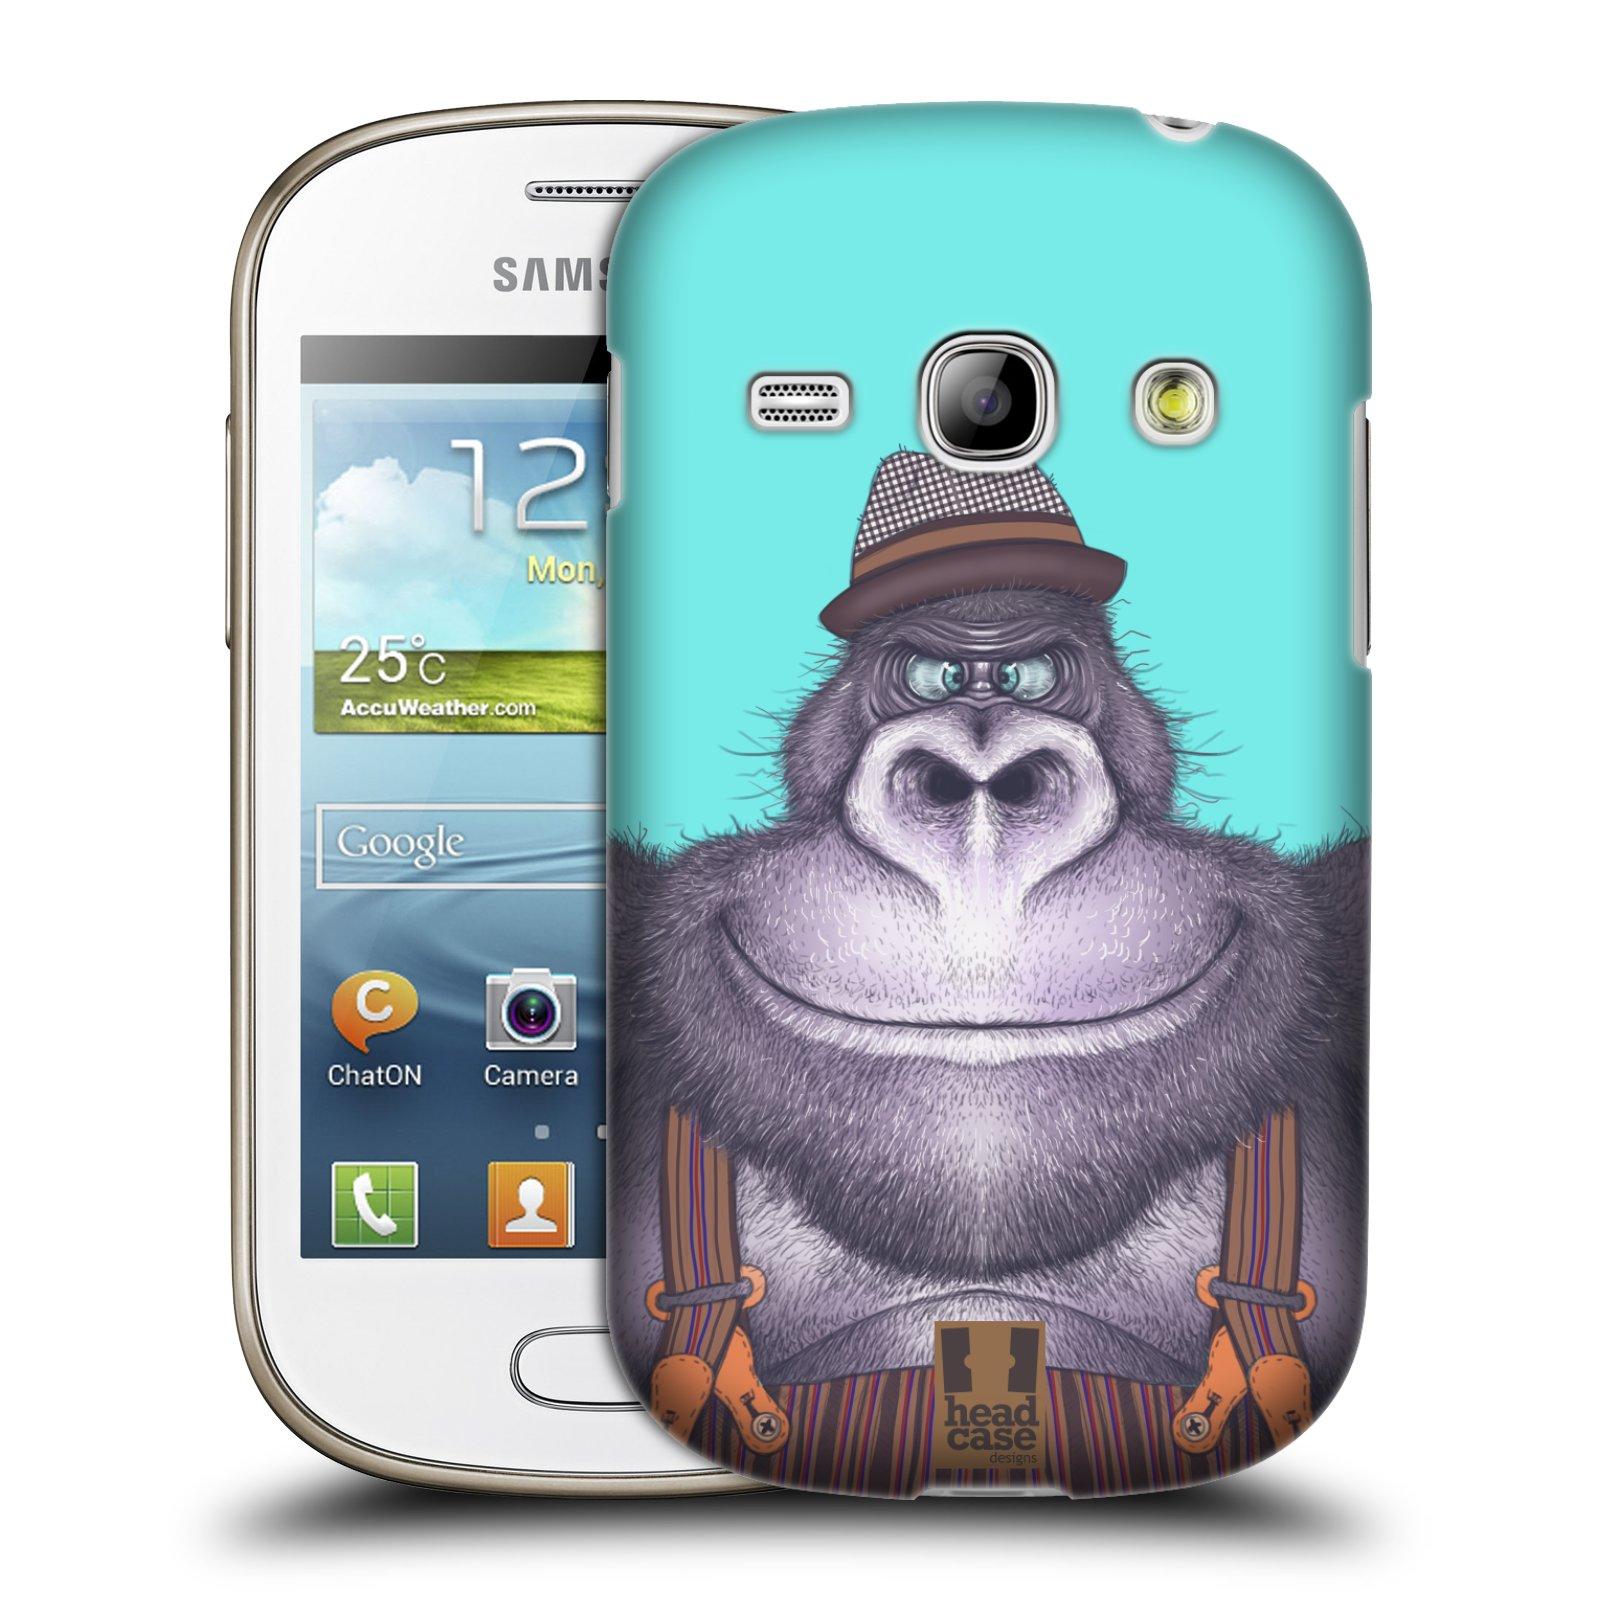 HEAD CASE plastový obal na mobil SAMSUNG GALAXY FAME (S6810) vzor Kreslená zvířátka gorila